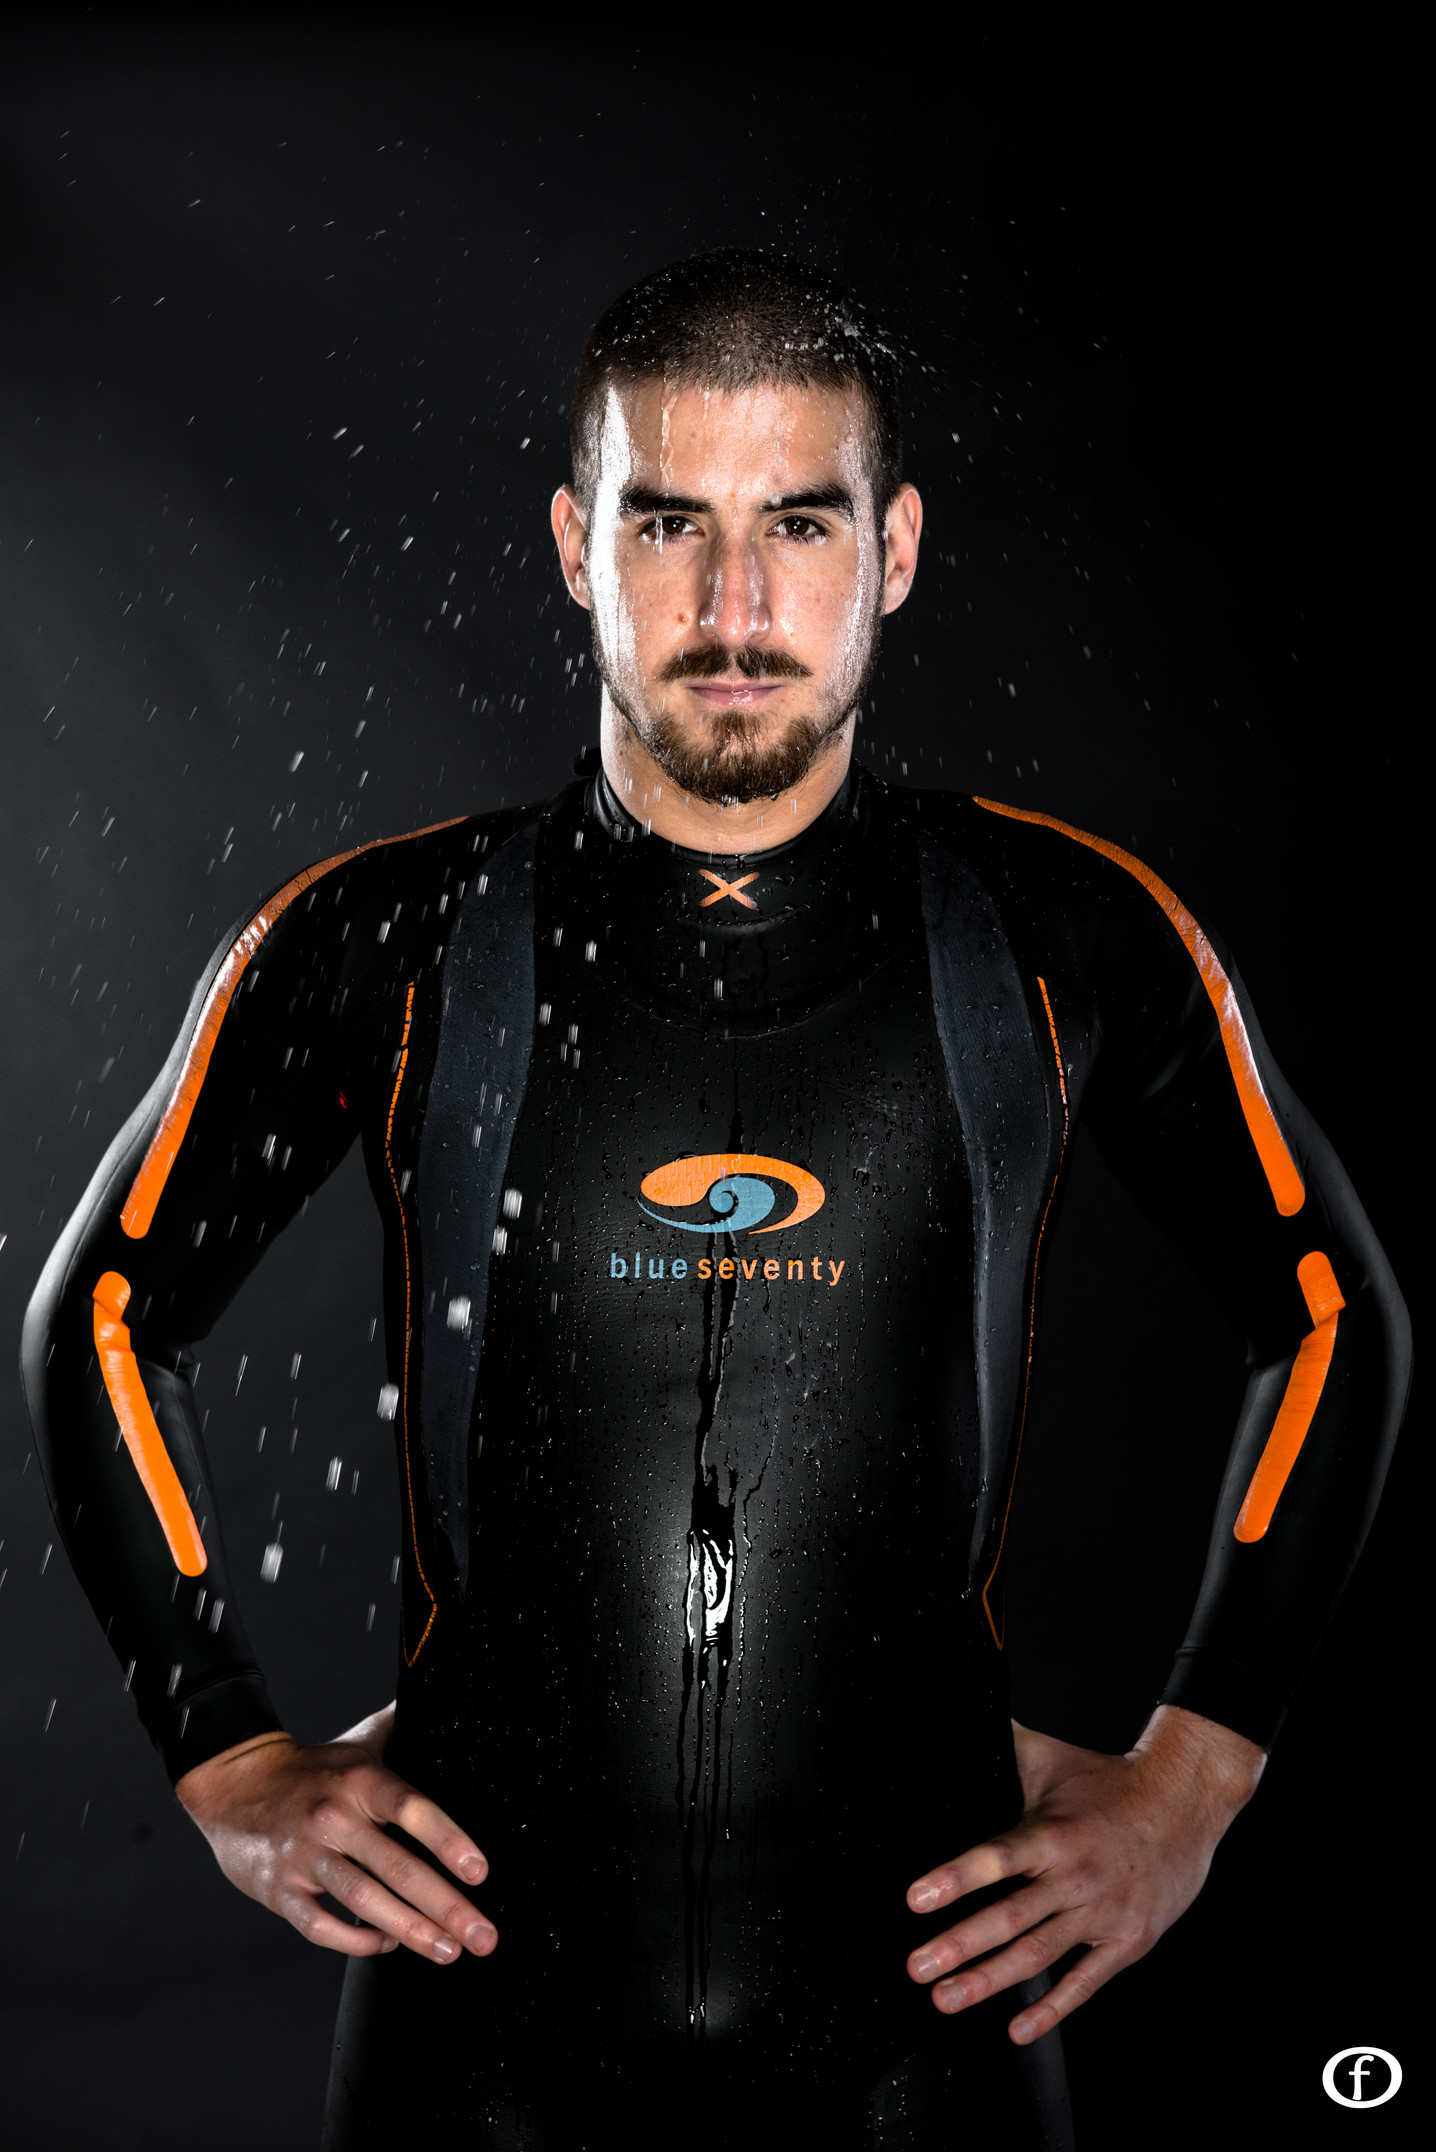 Triatleta Felipe Aguayo-9293.jpg